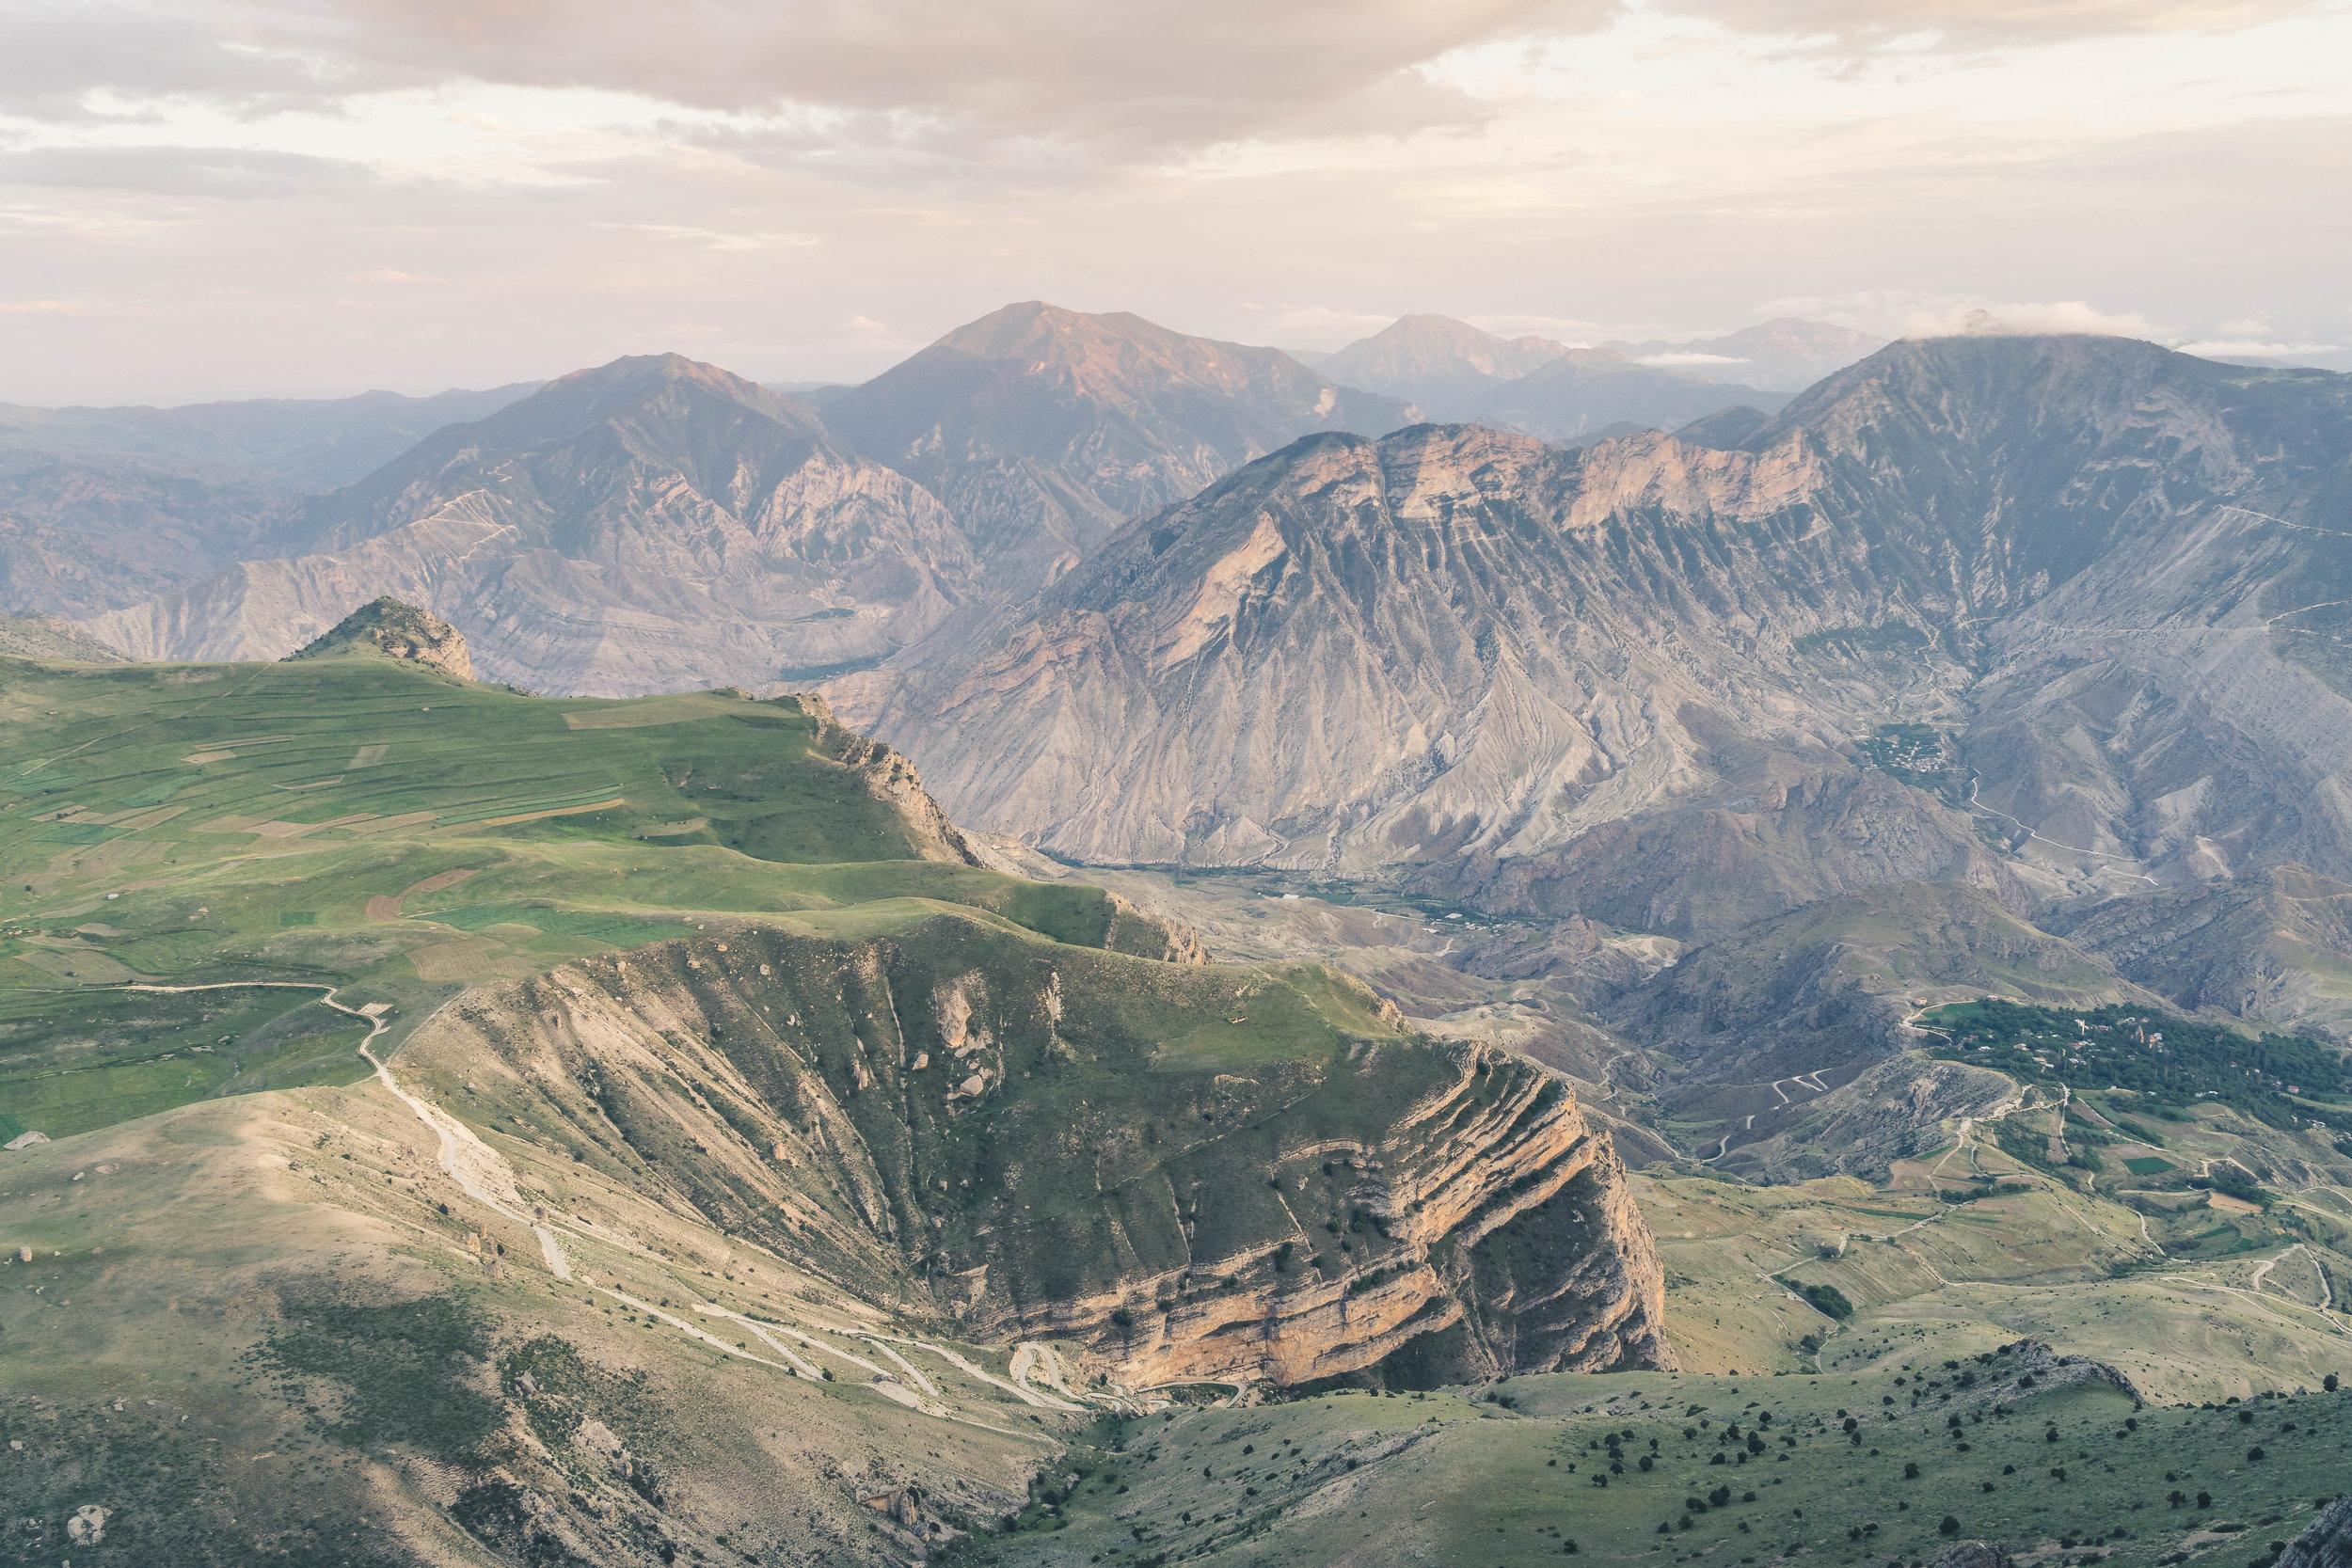 Artvin province